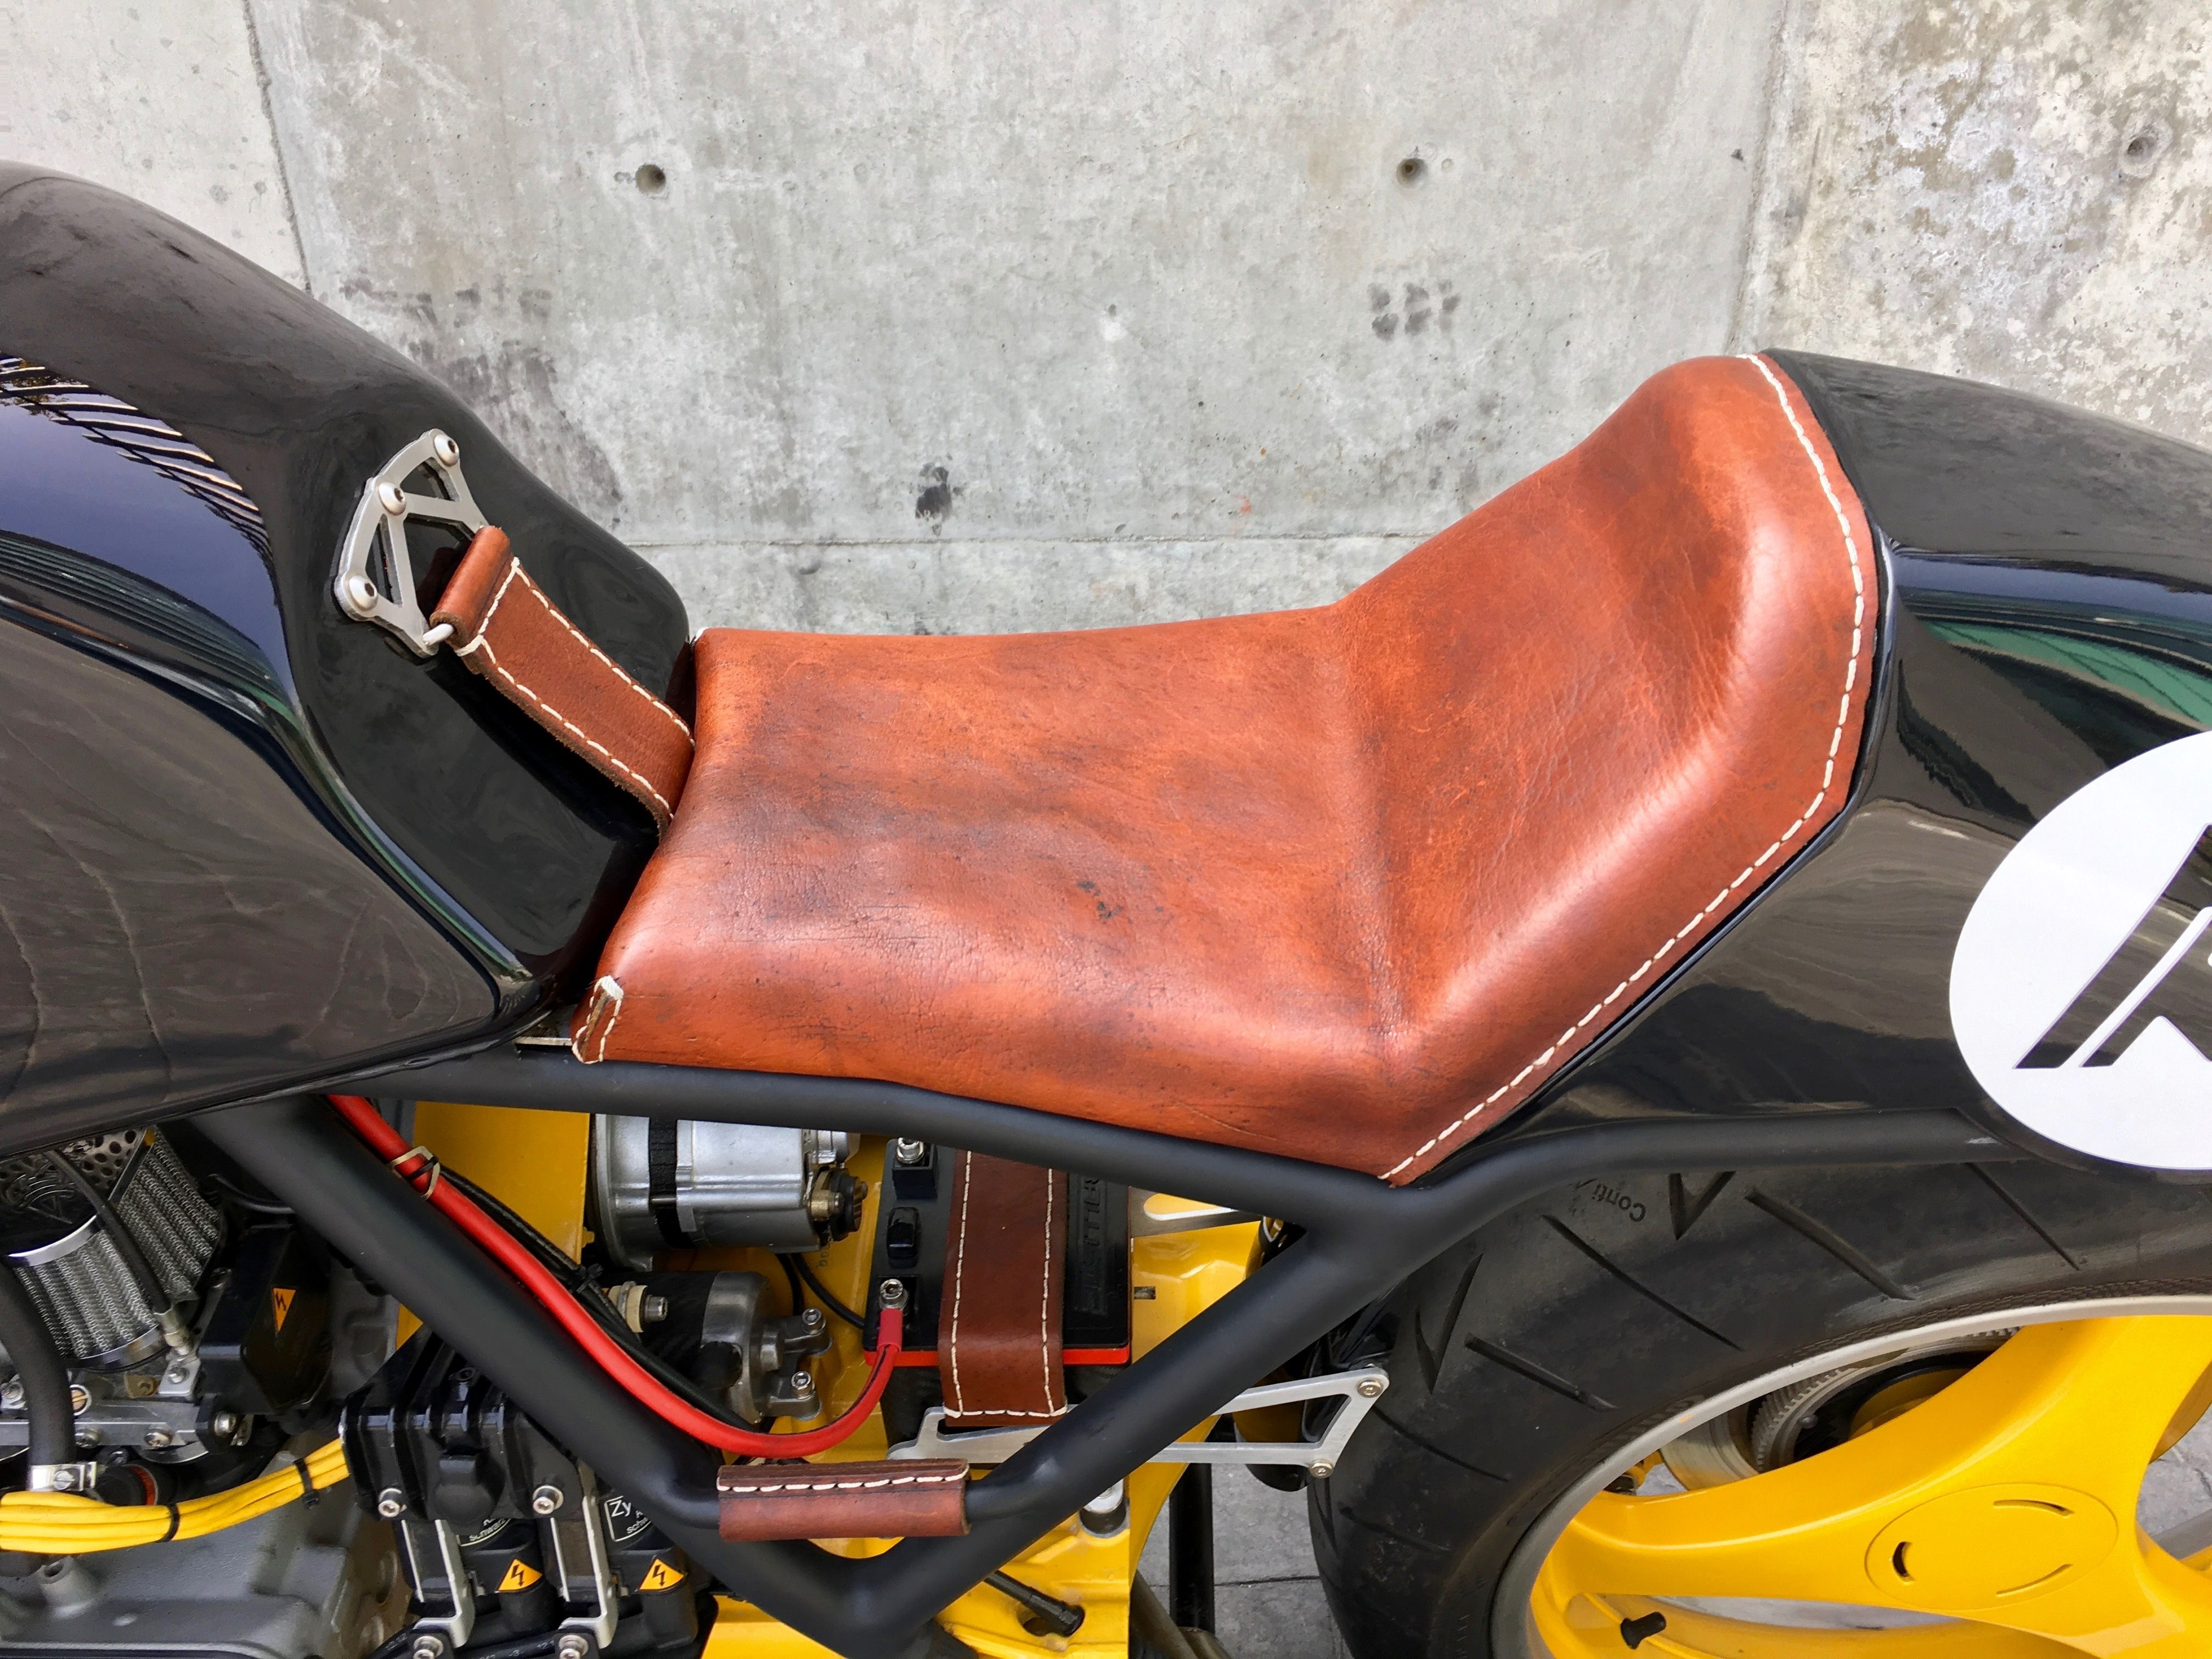 bmw k1 cafe racer,zweiger, hand made leather seat | bmw k1